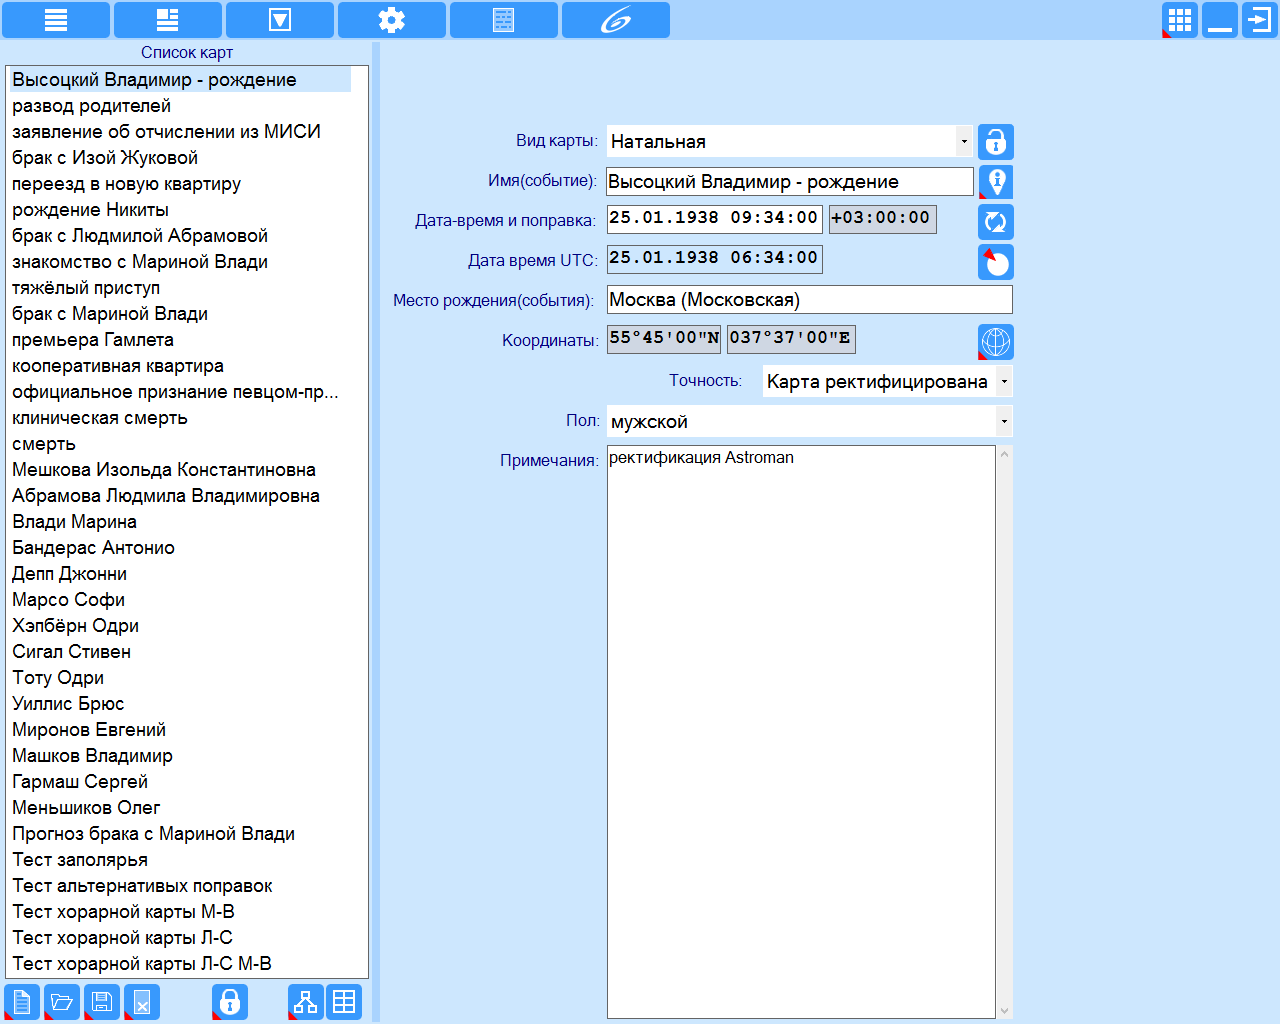 Программа ректификации гороскопа онлайн